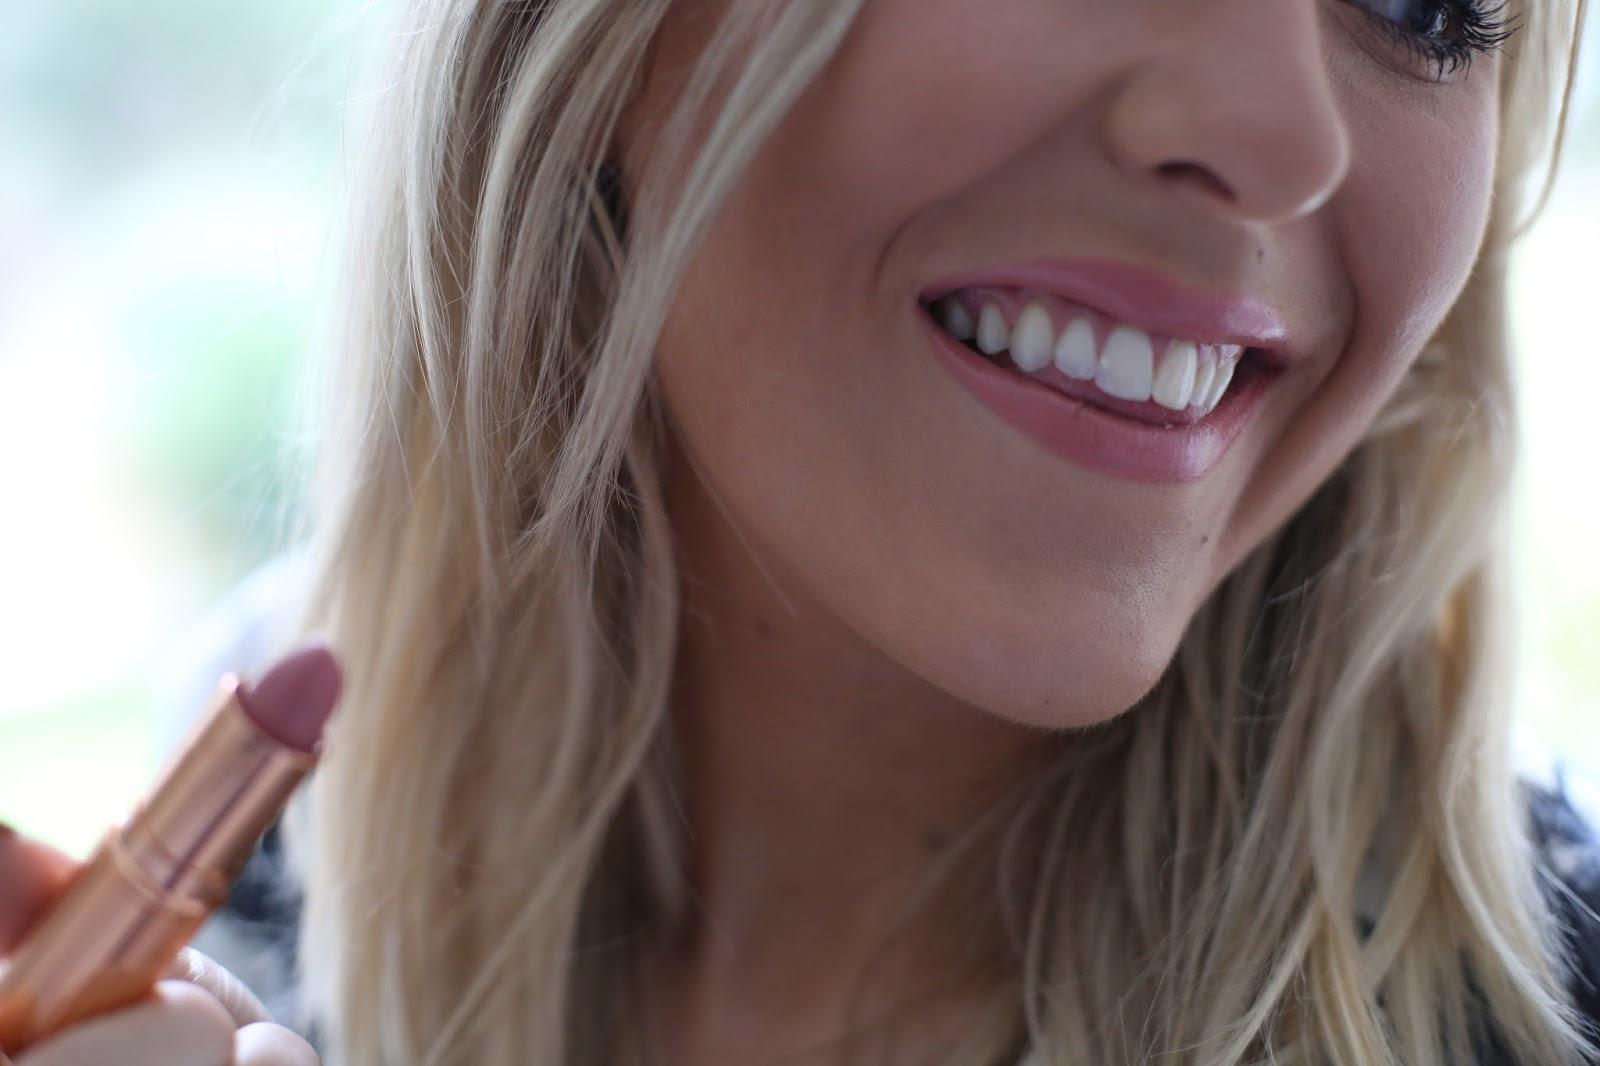 Charlotte tilbury lipstick in valentine